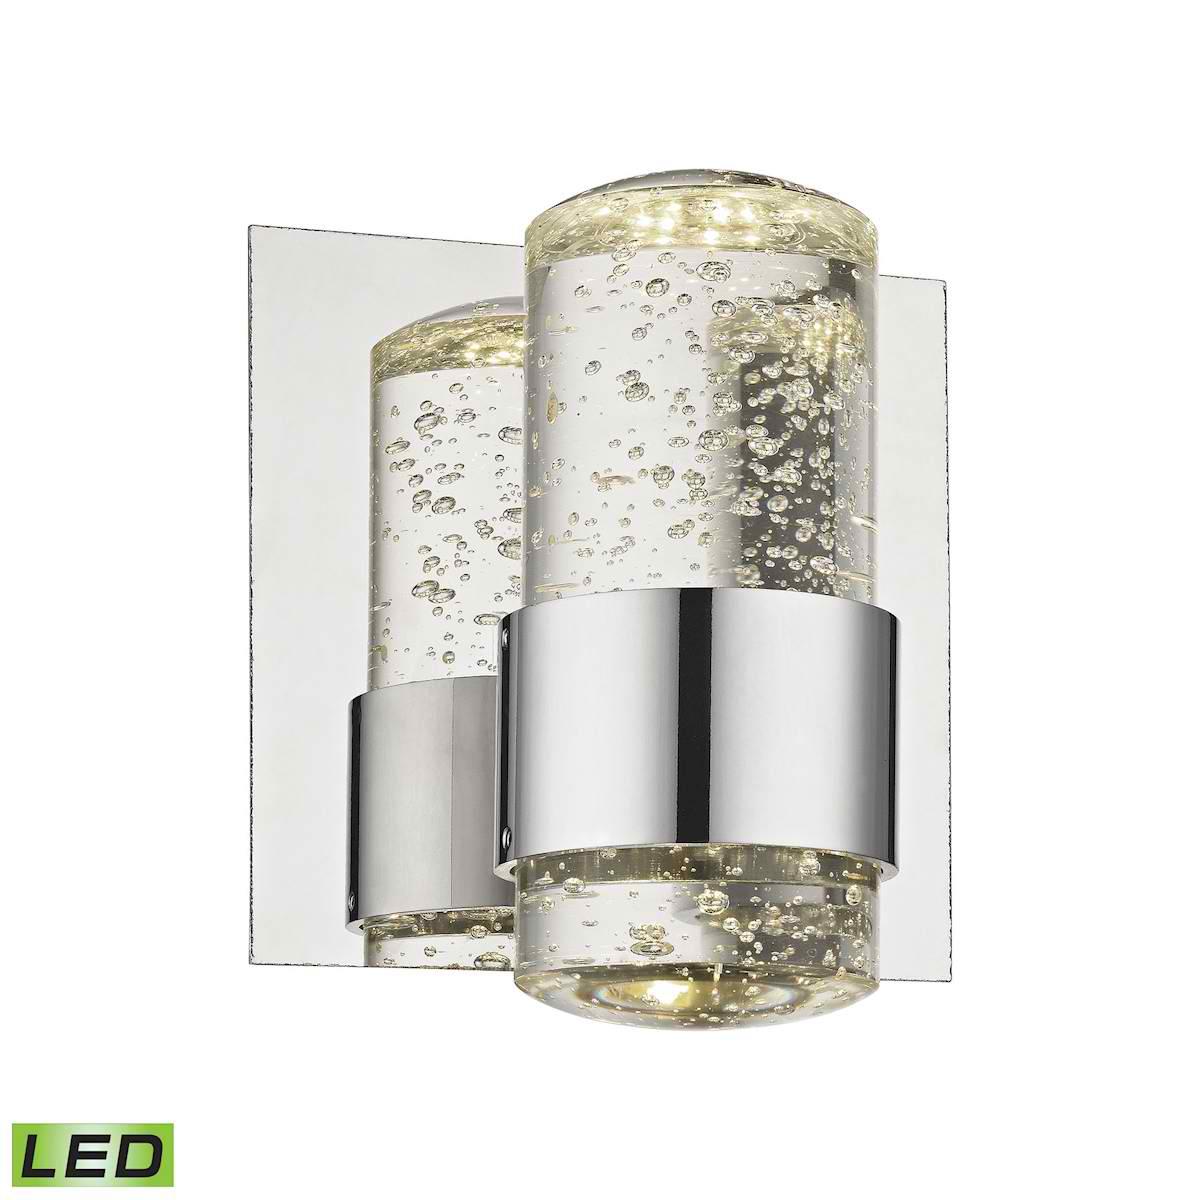 Surrey Bath Vanity - LED 1 Light Bubbled Glass with Chrome Finish